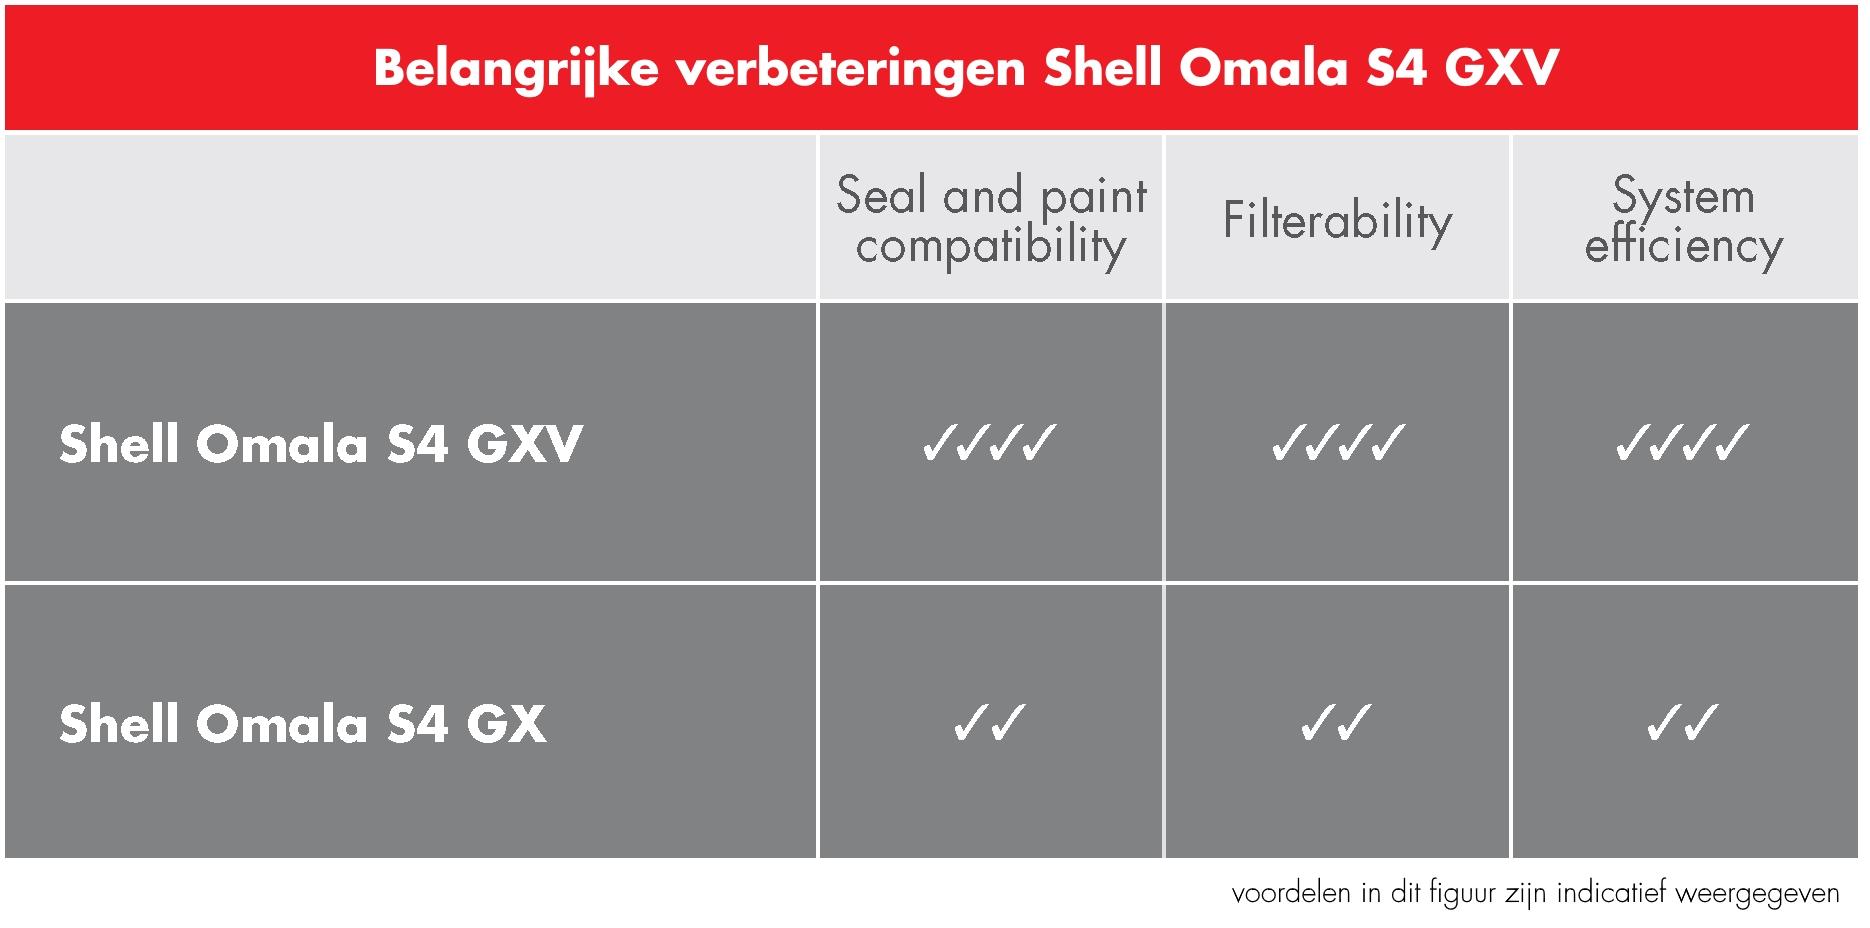 voordelen Shell Omala S4 GXV